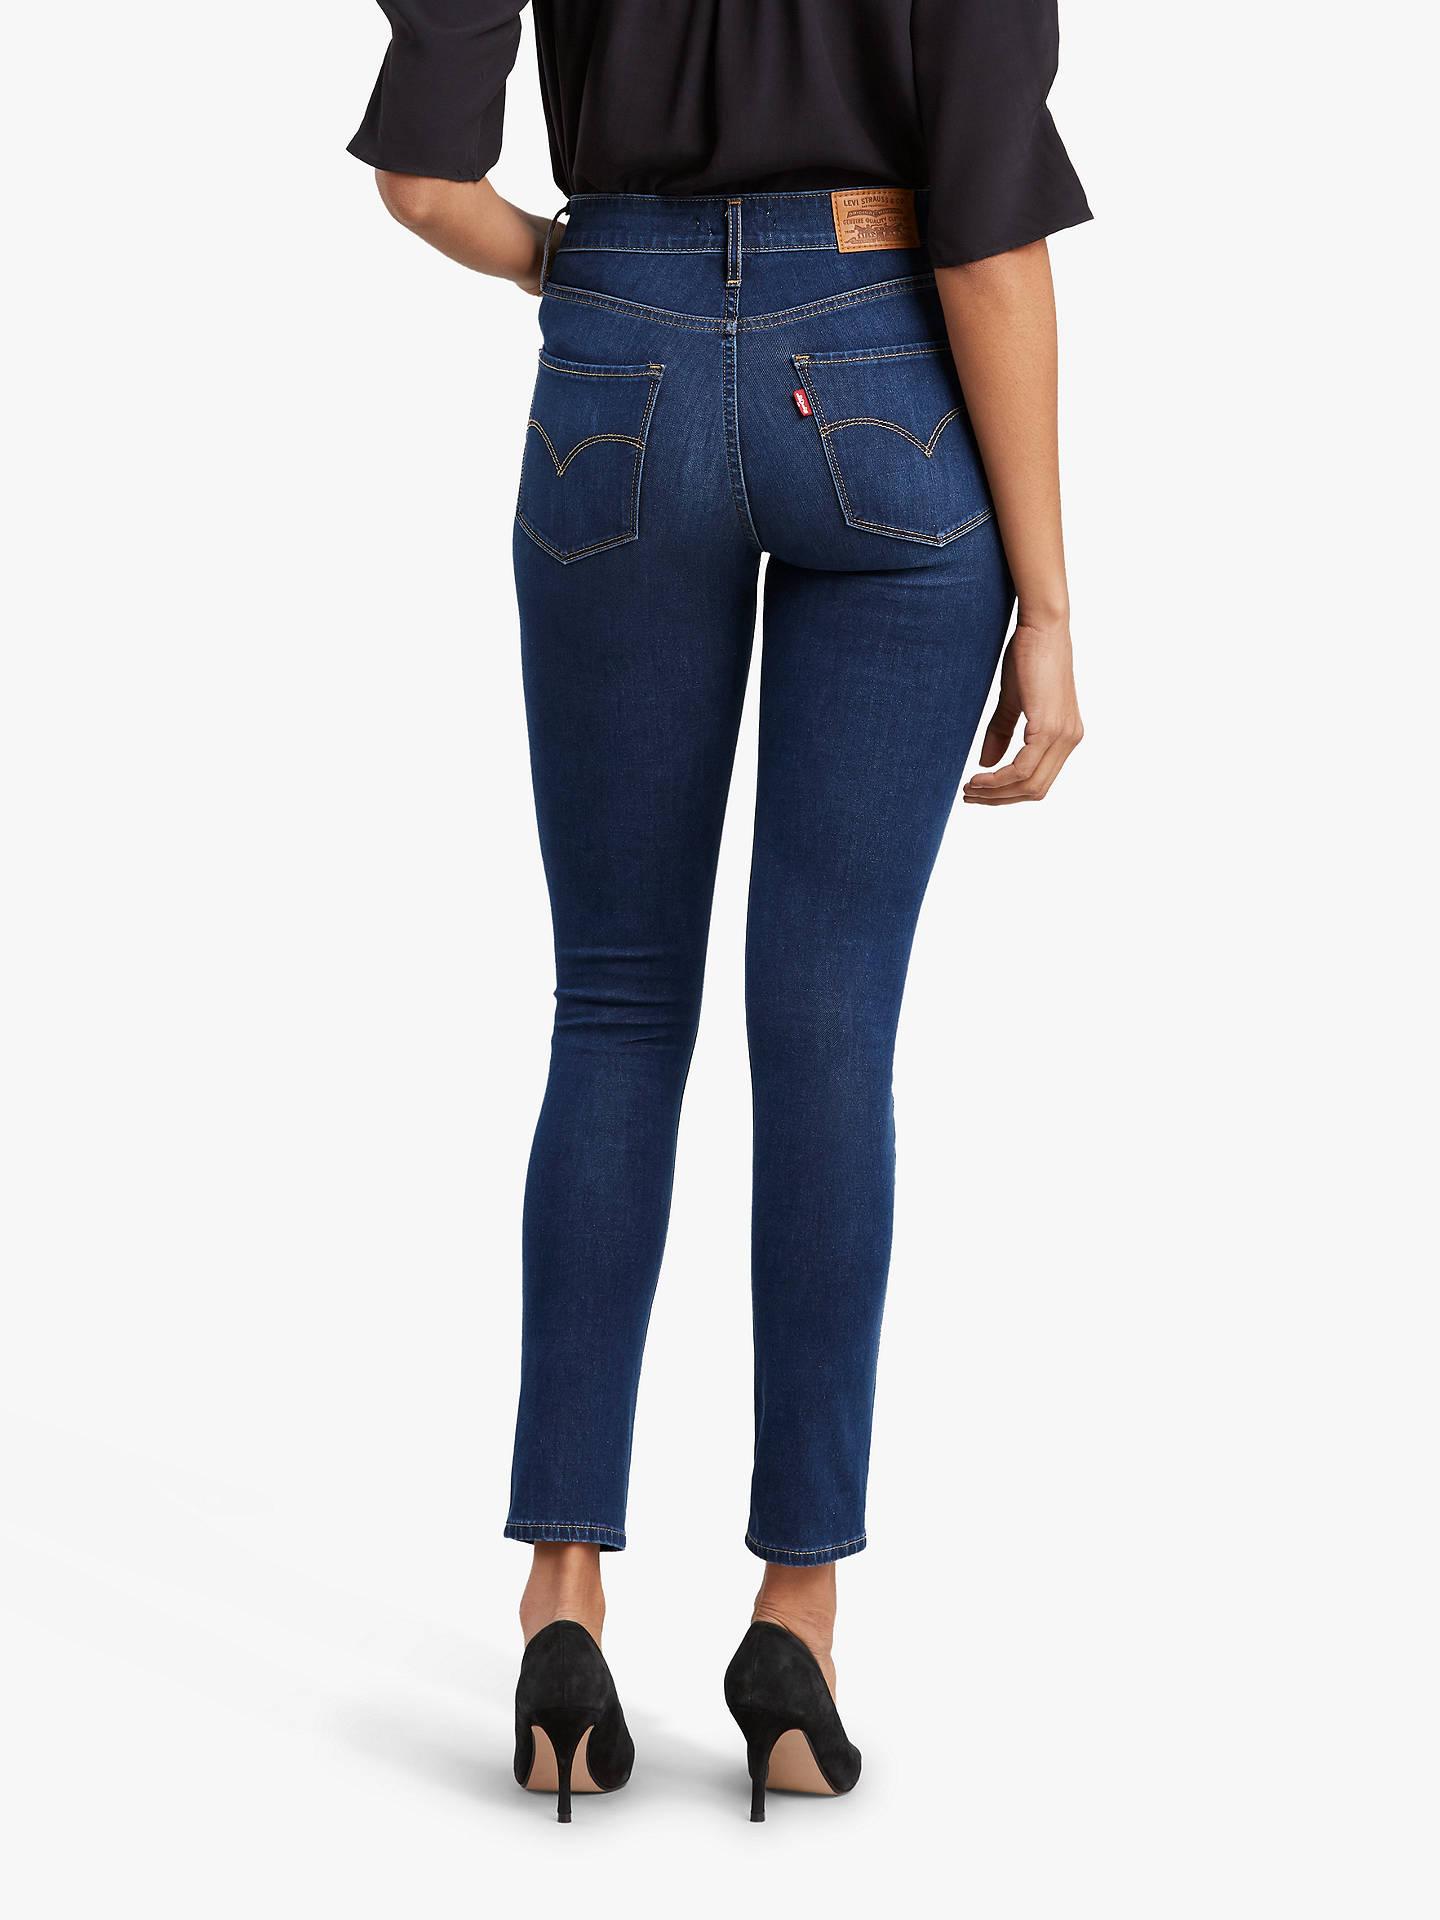 Levi's Ladies 721 High Rise Skinny Dark Blue Jeans W27 L28